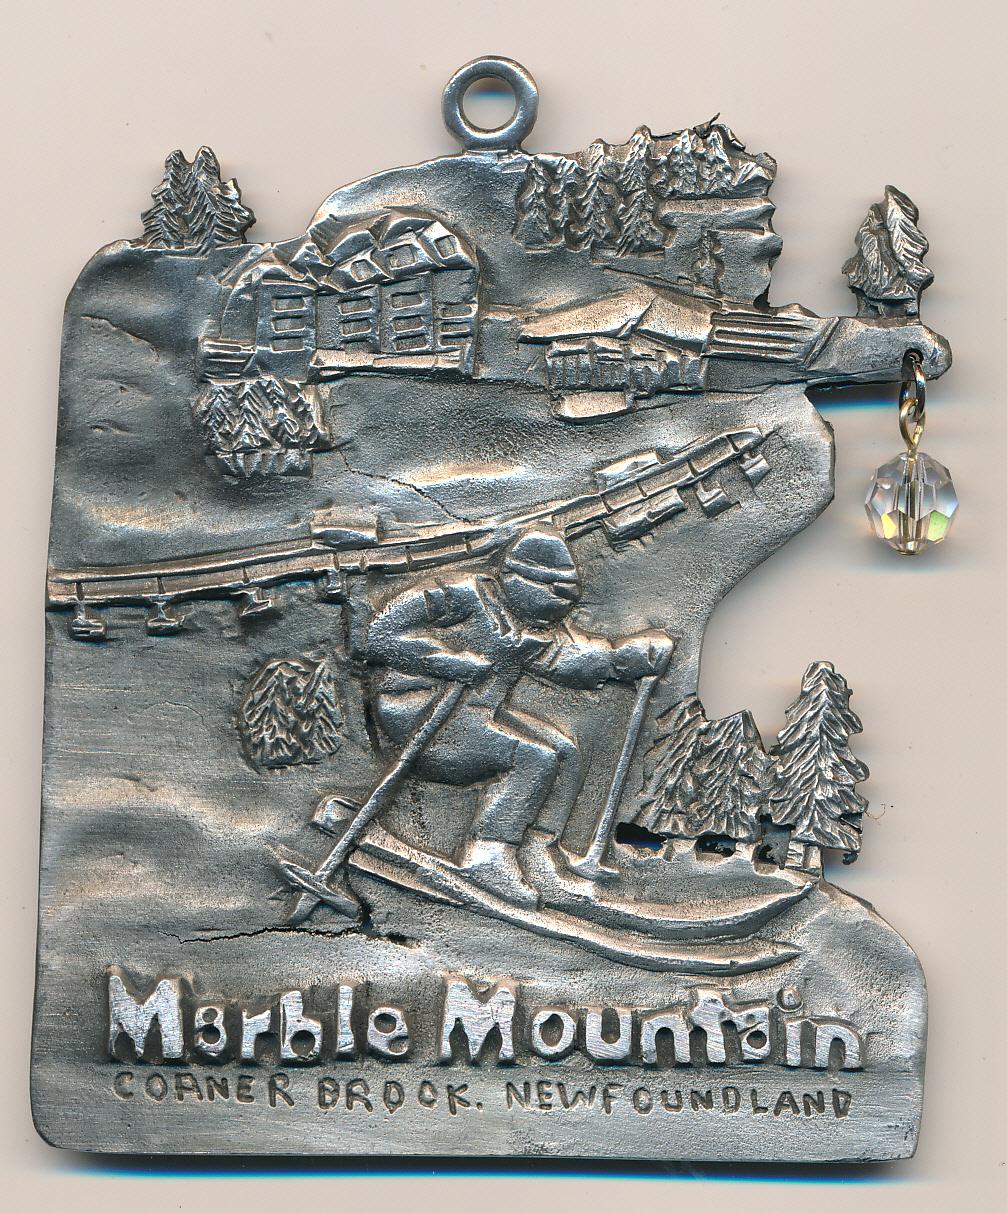 Marble Mountain, Cornerbrook